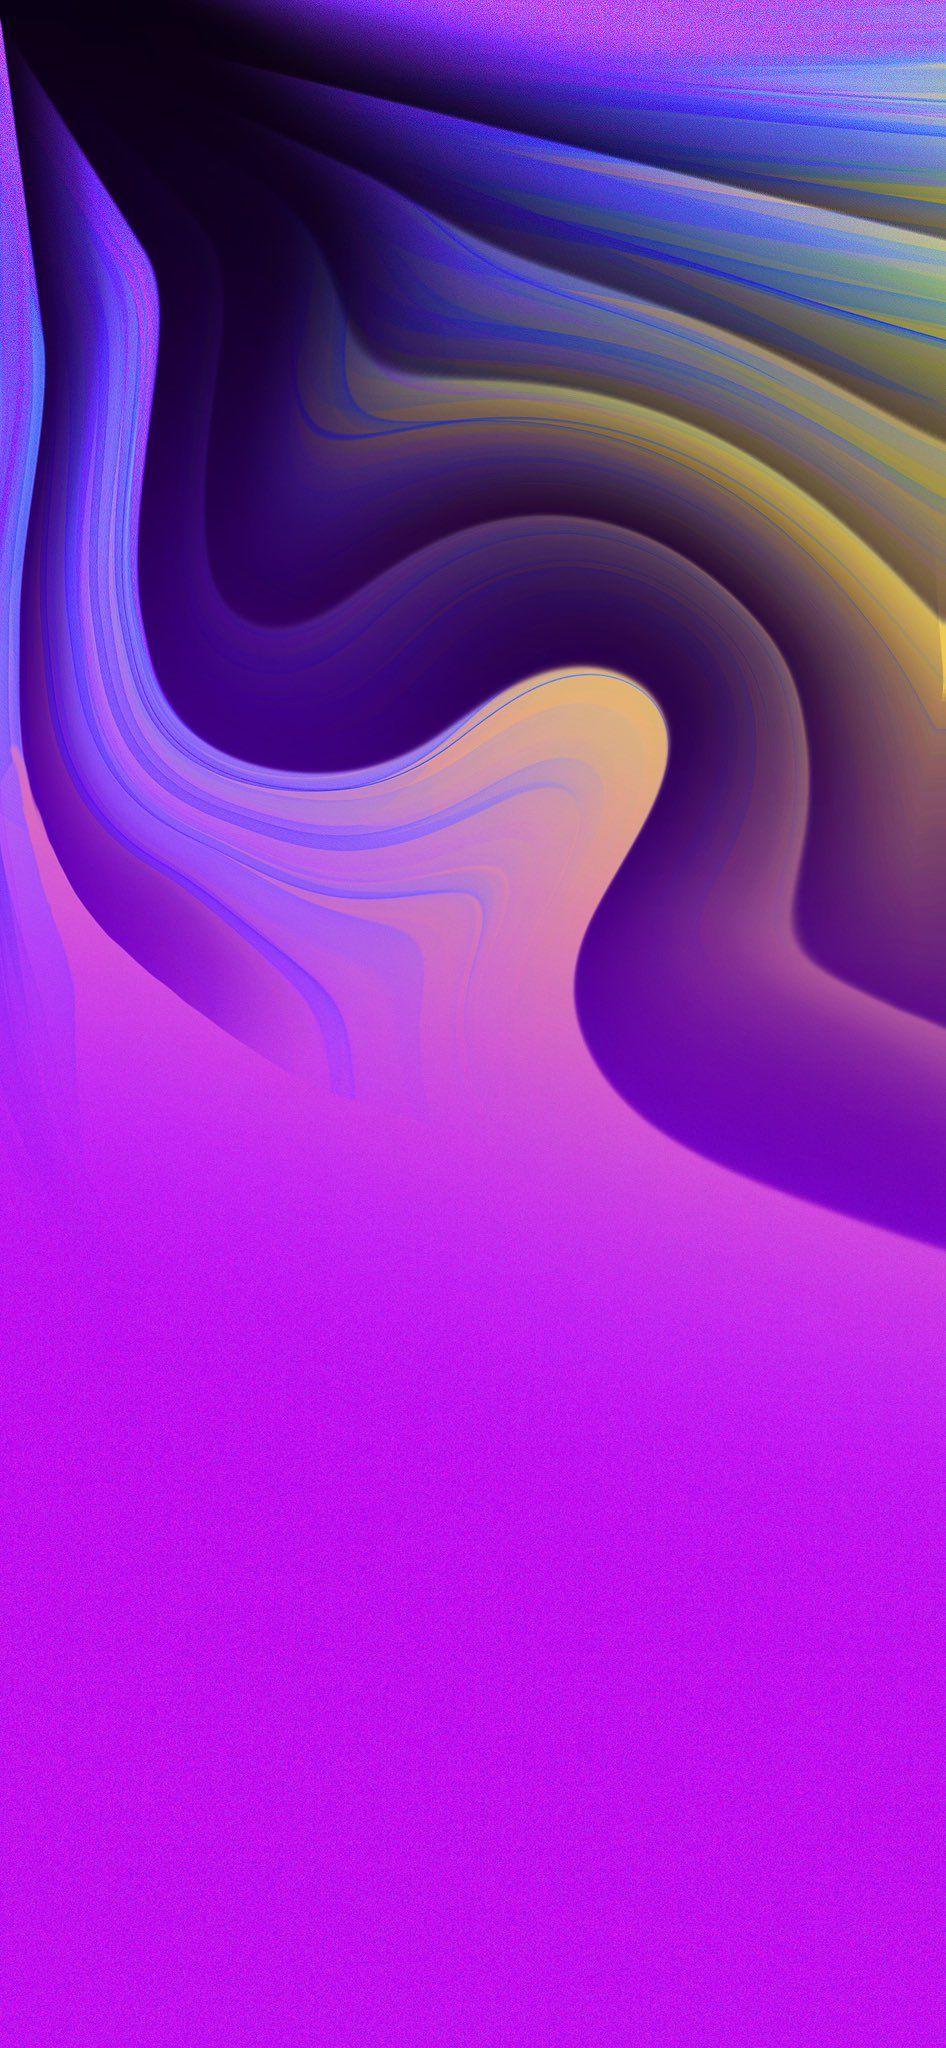 Hotspot4U on Graphic wallpaper, Purple wallpaper phone